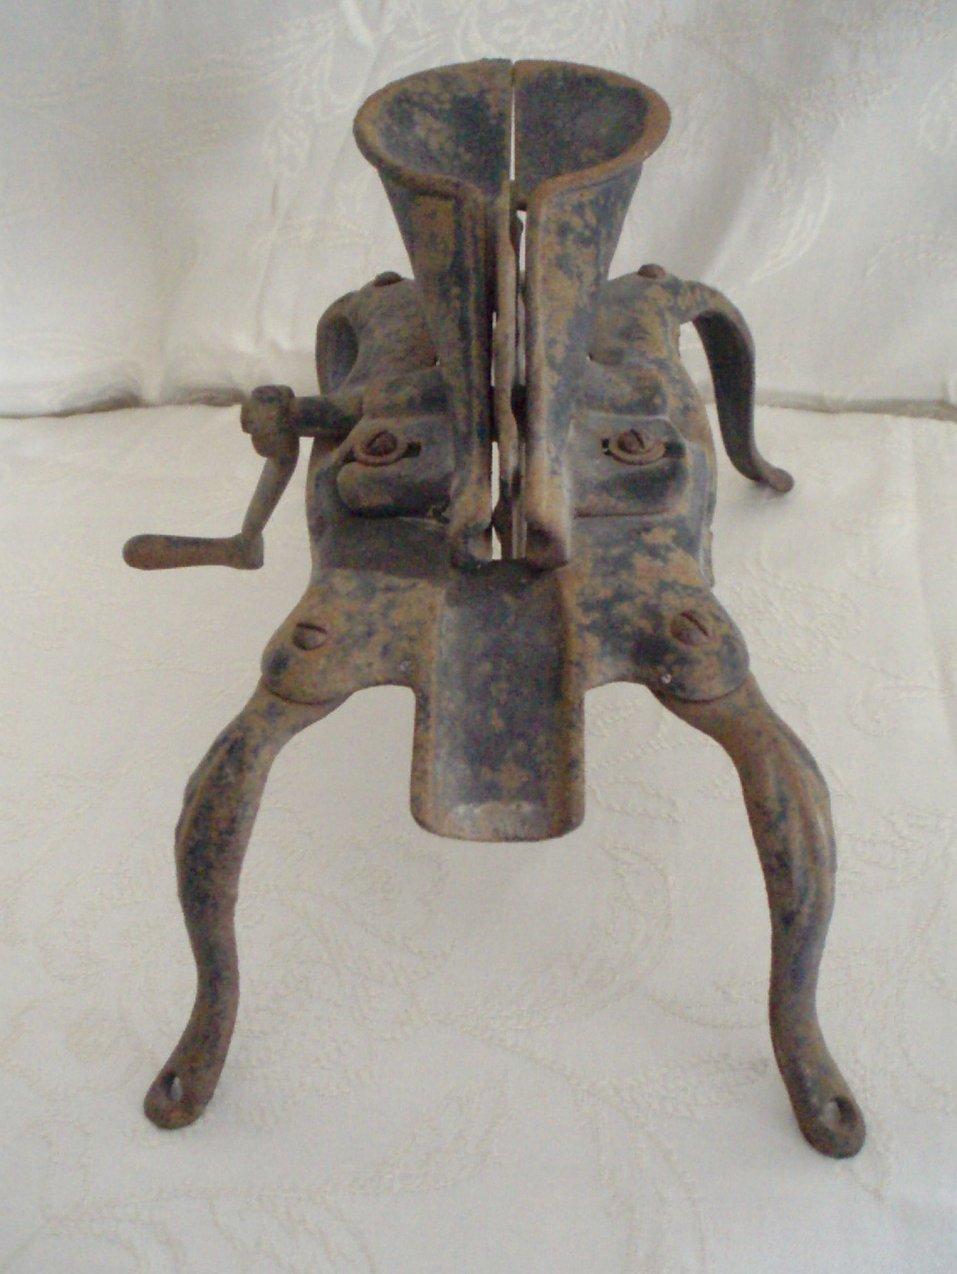 antique cherry pitter stoner manual cast iron circa 1870